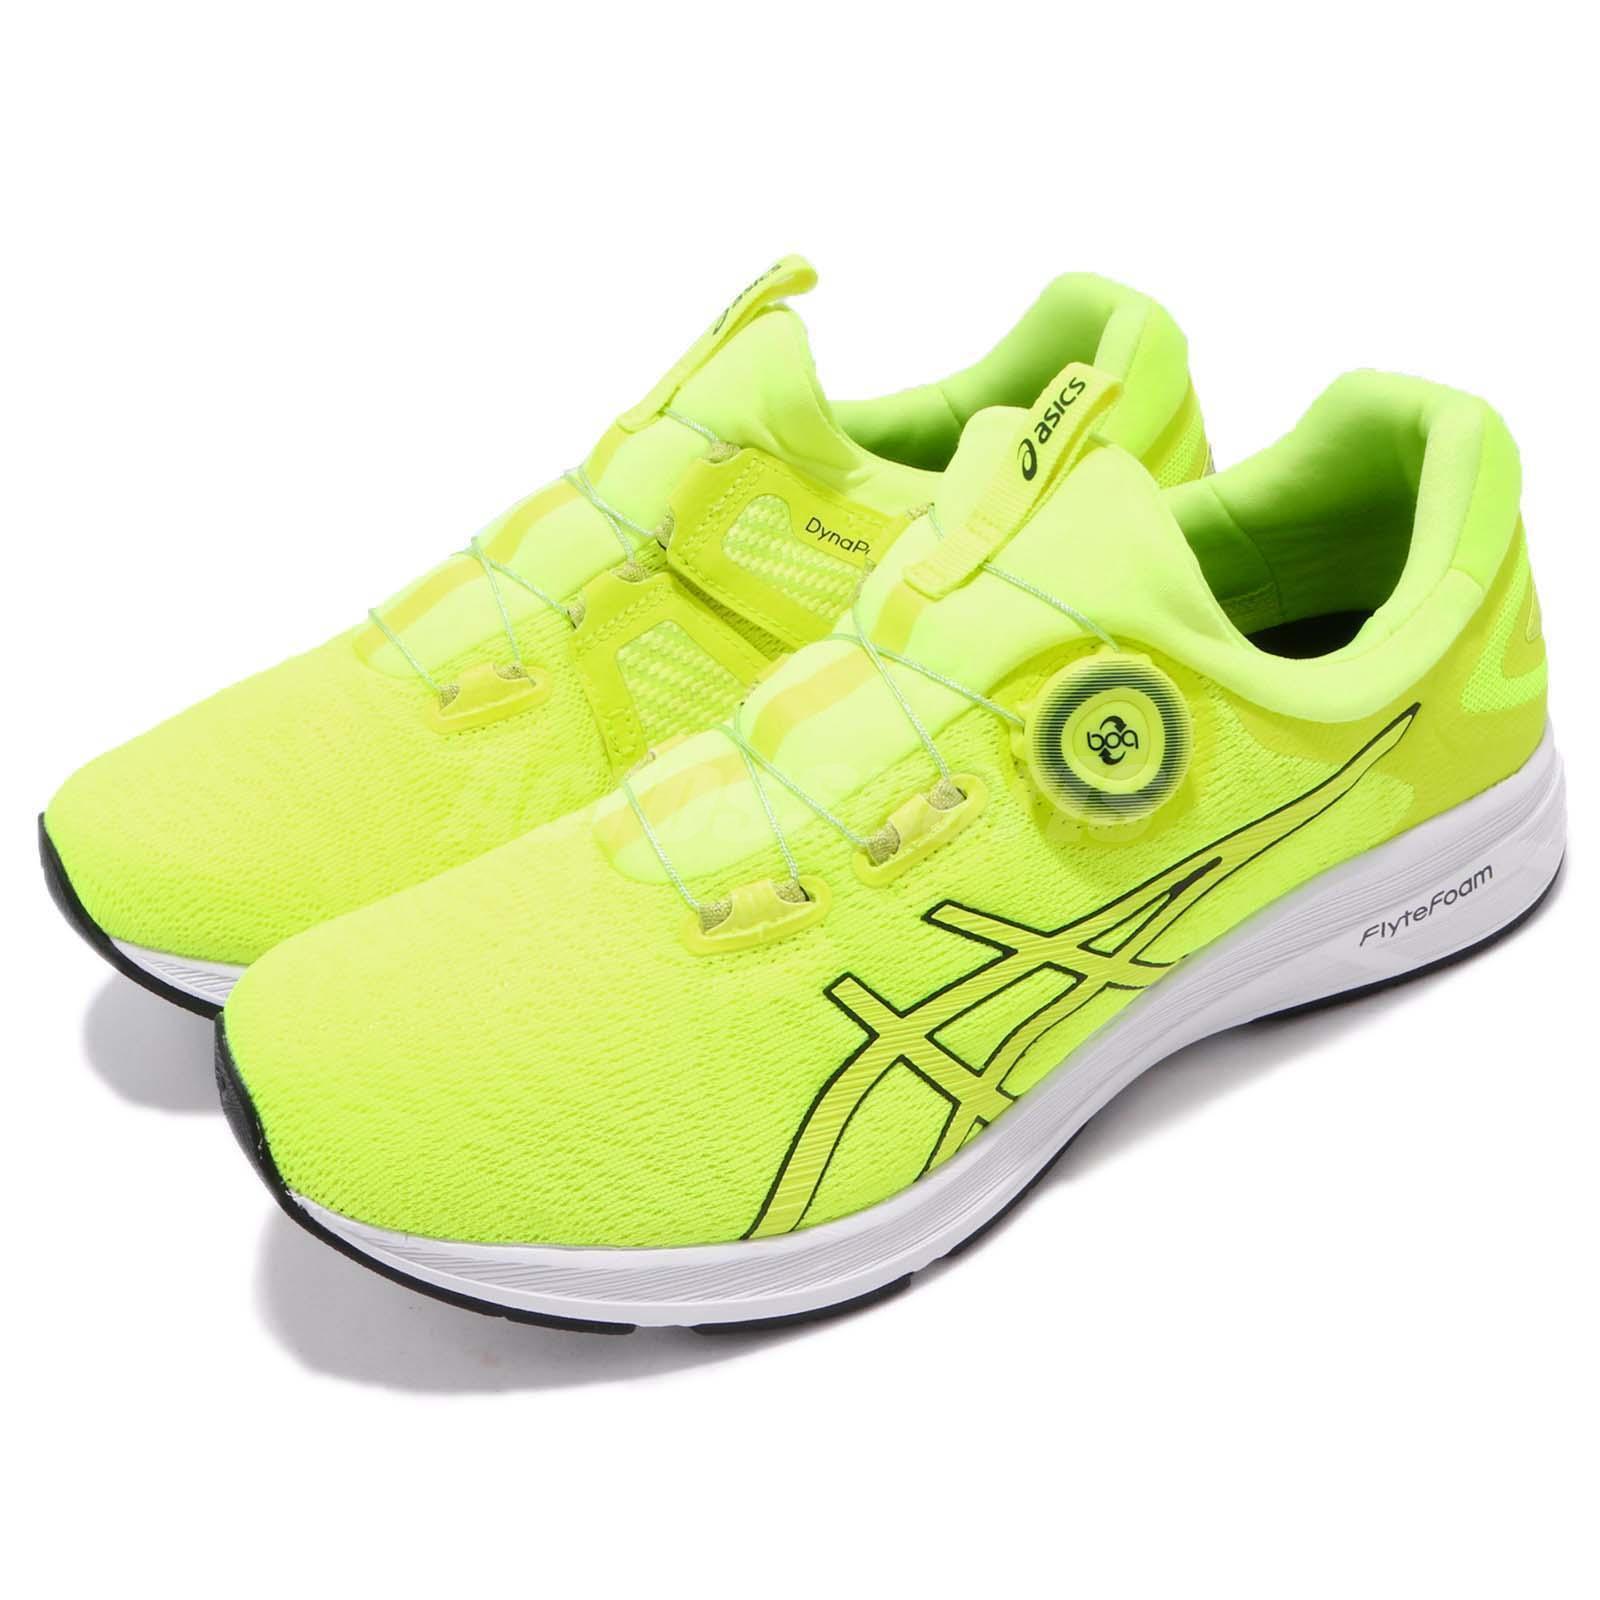 Asics Dynamis Safety Jaune Blanc Men Running Chaussures Baskets Trainer T7D1N-0701